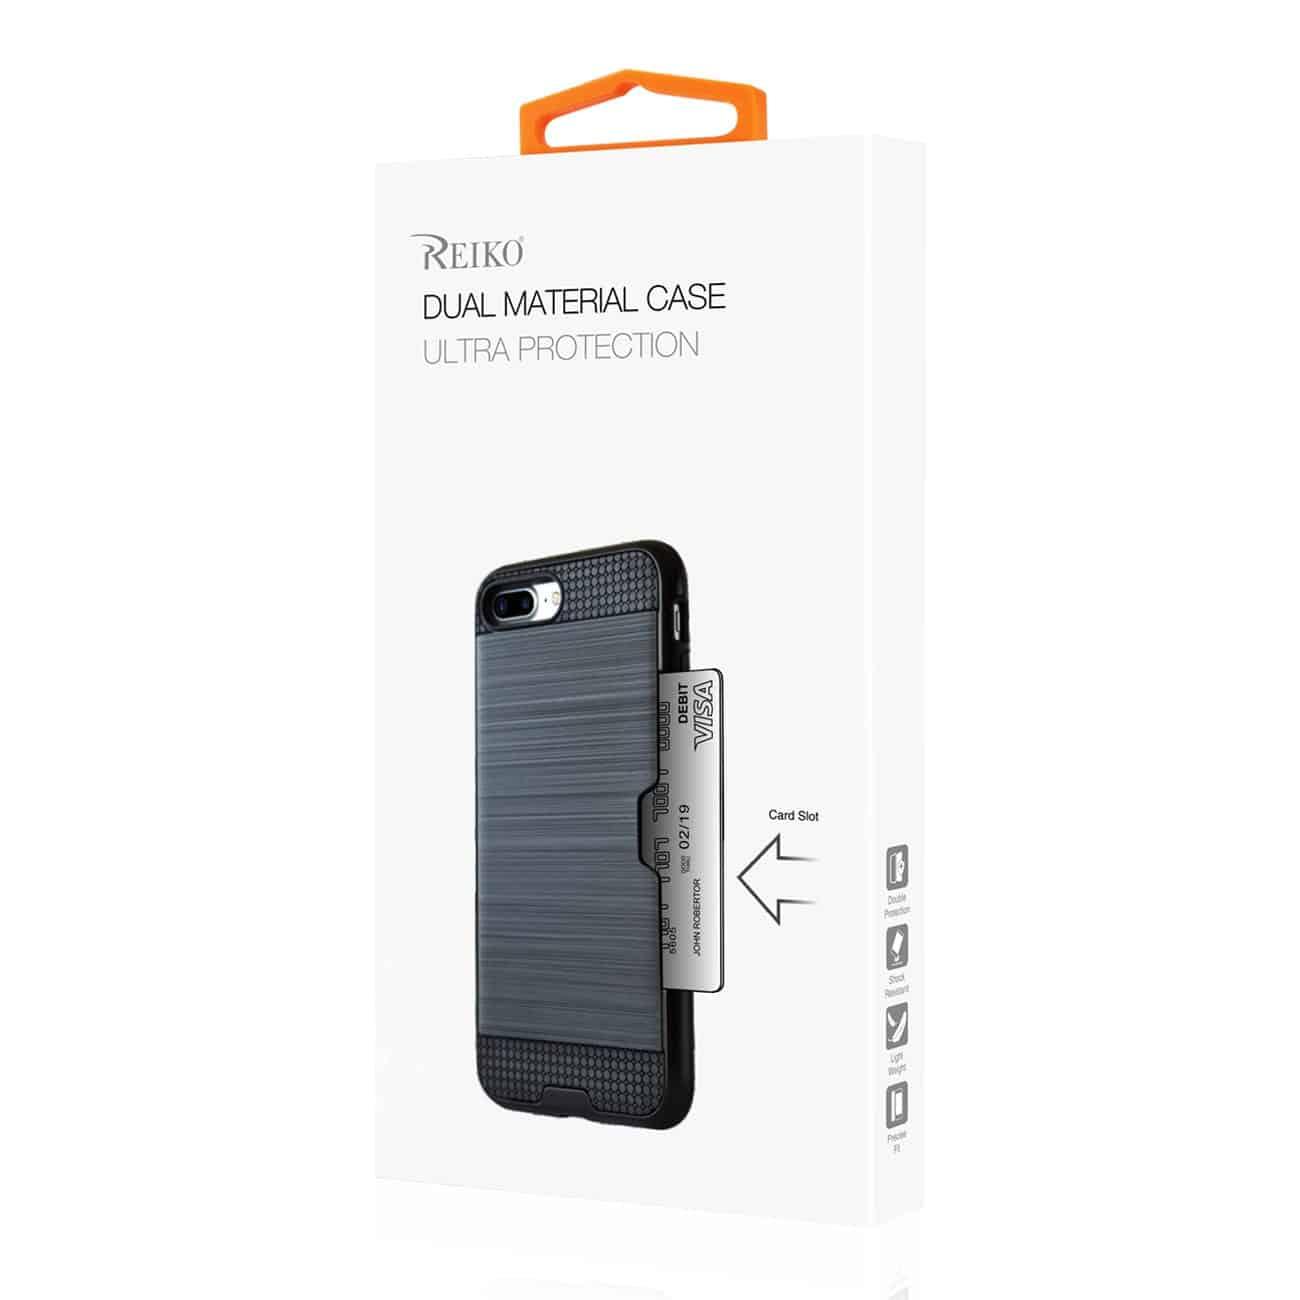 Samsung J3(2018) Slim Armor Hybrid Case With Card Holder In Black